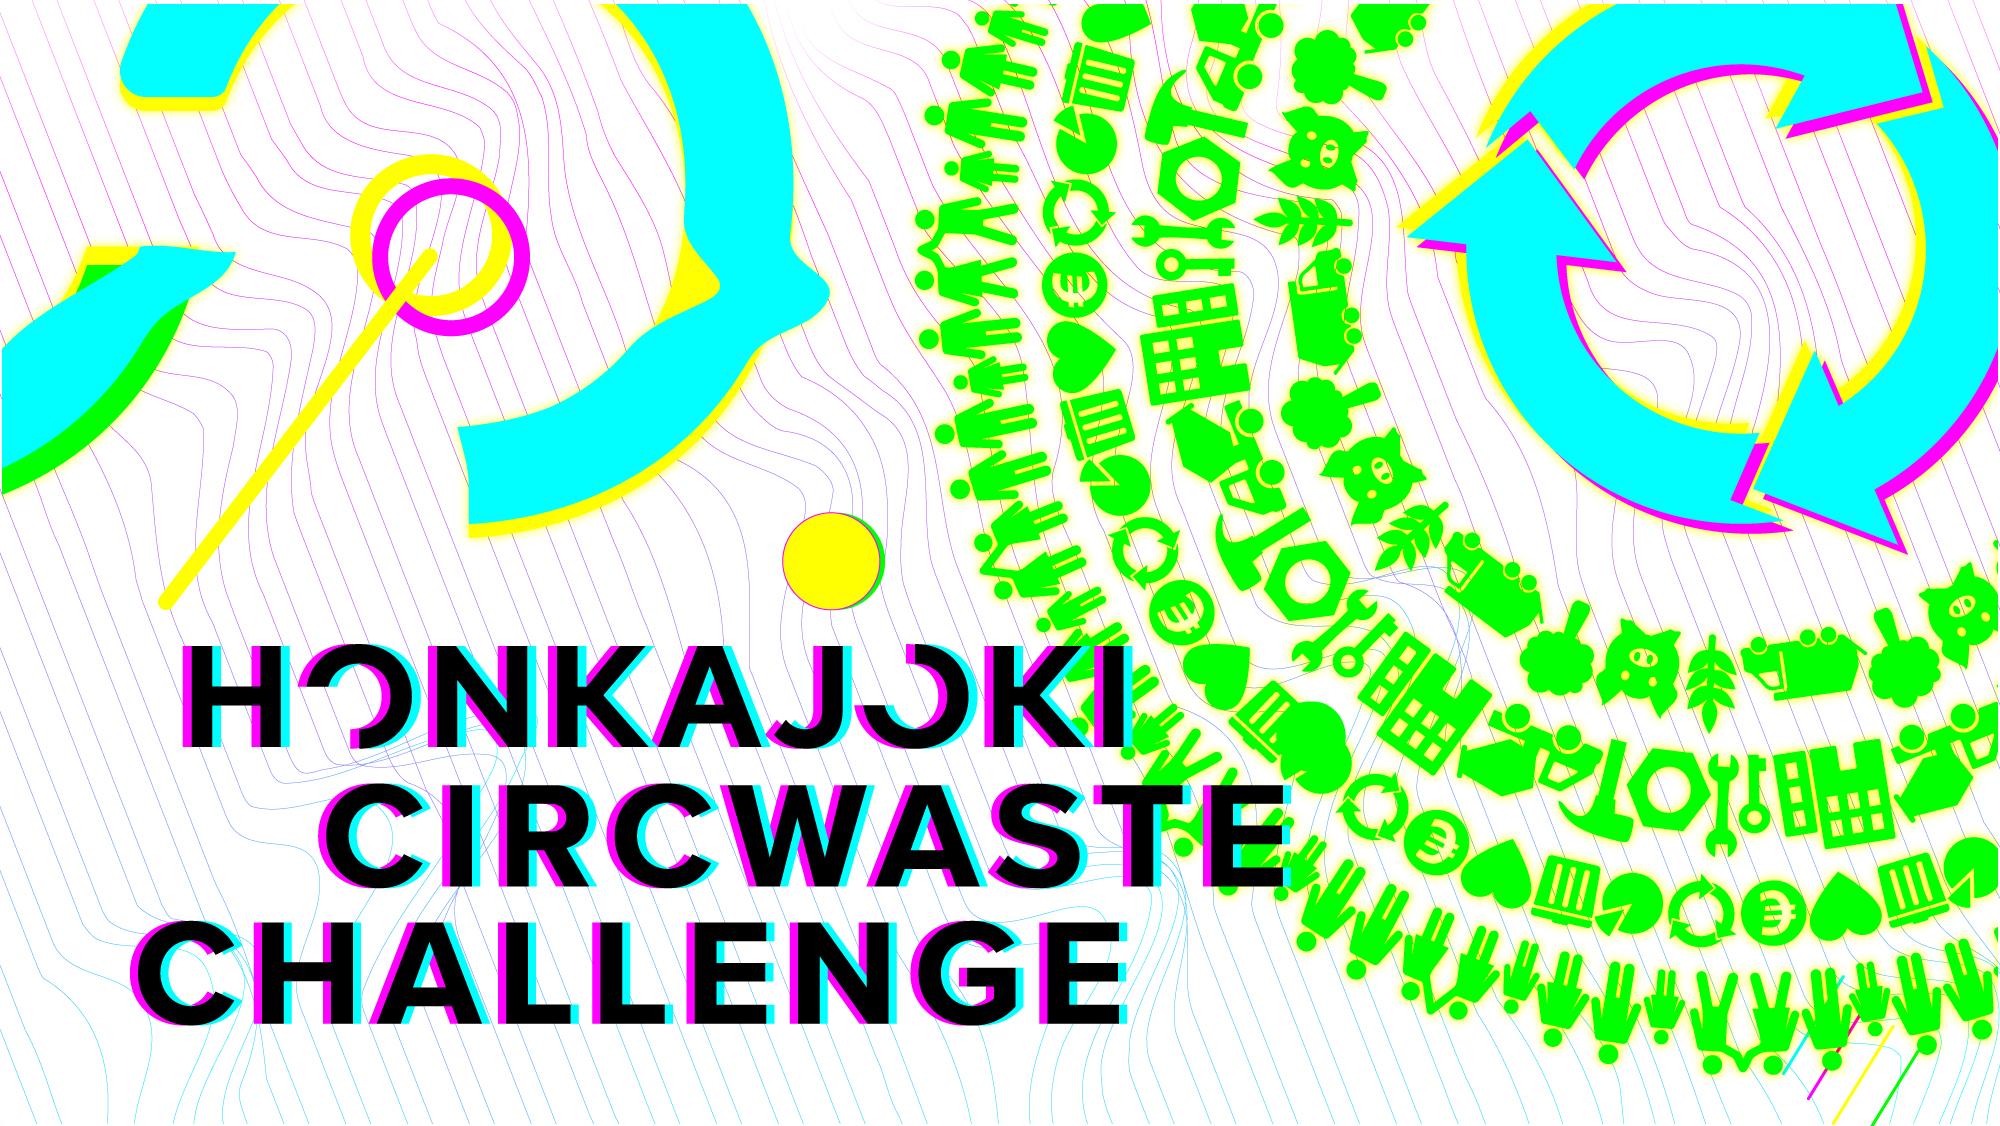 Honkajoki CIRCWASTE Challenge